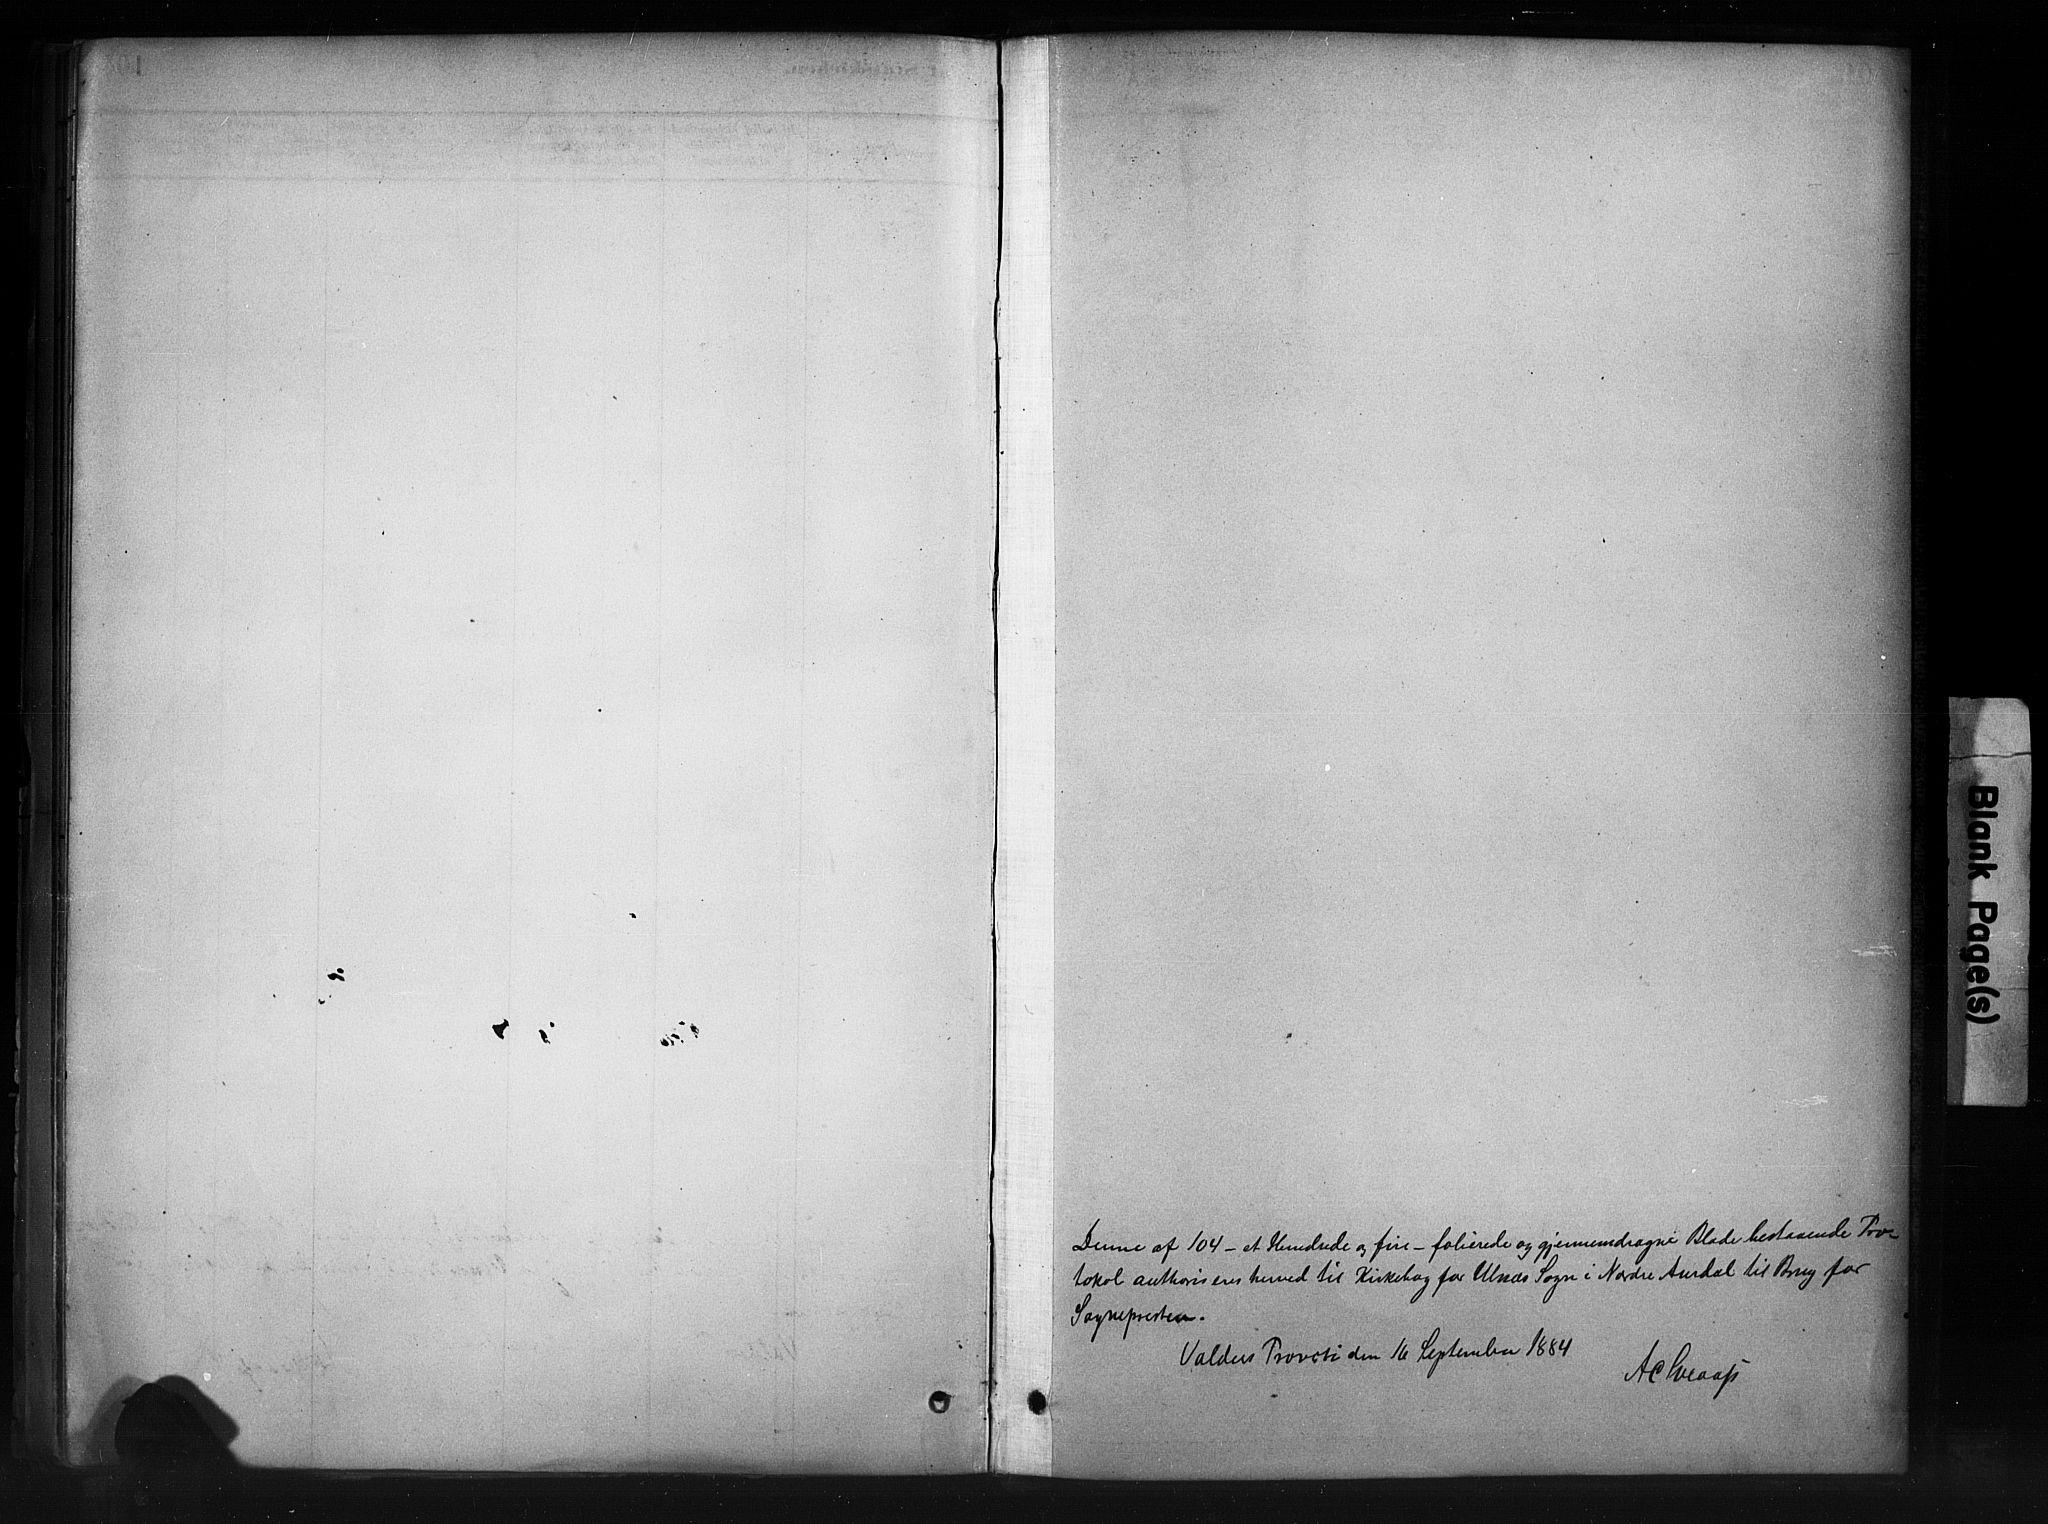 SAH, Nord-Aurdal prestekontor, Ministerialbok nr. 11, 1883-1896